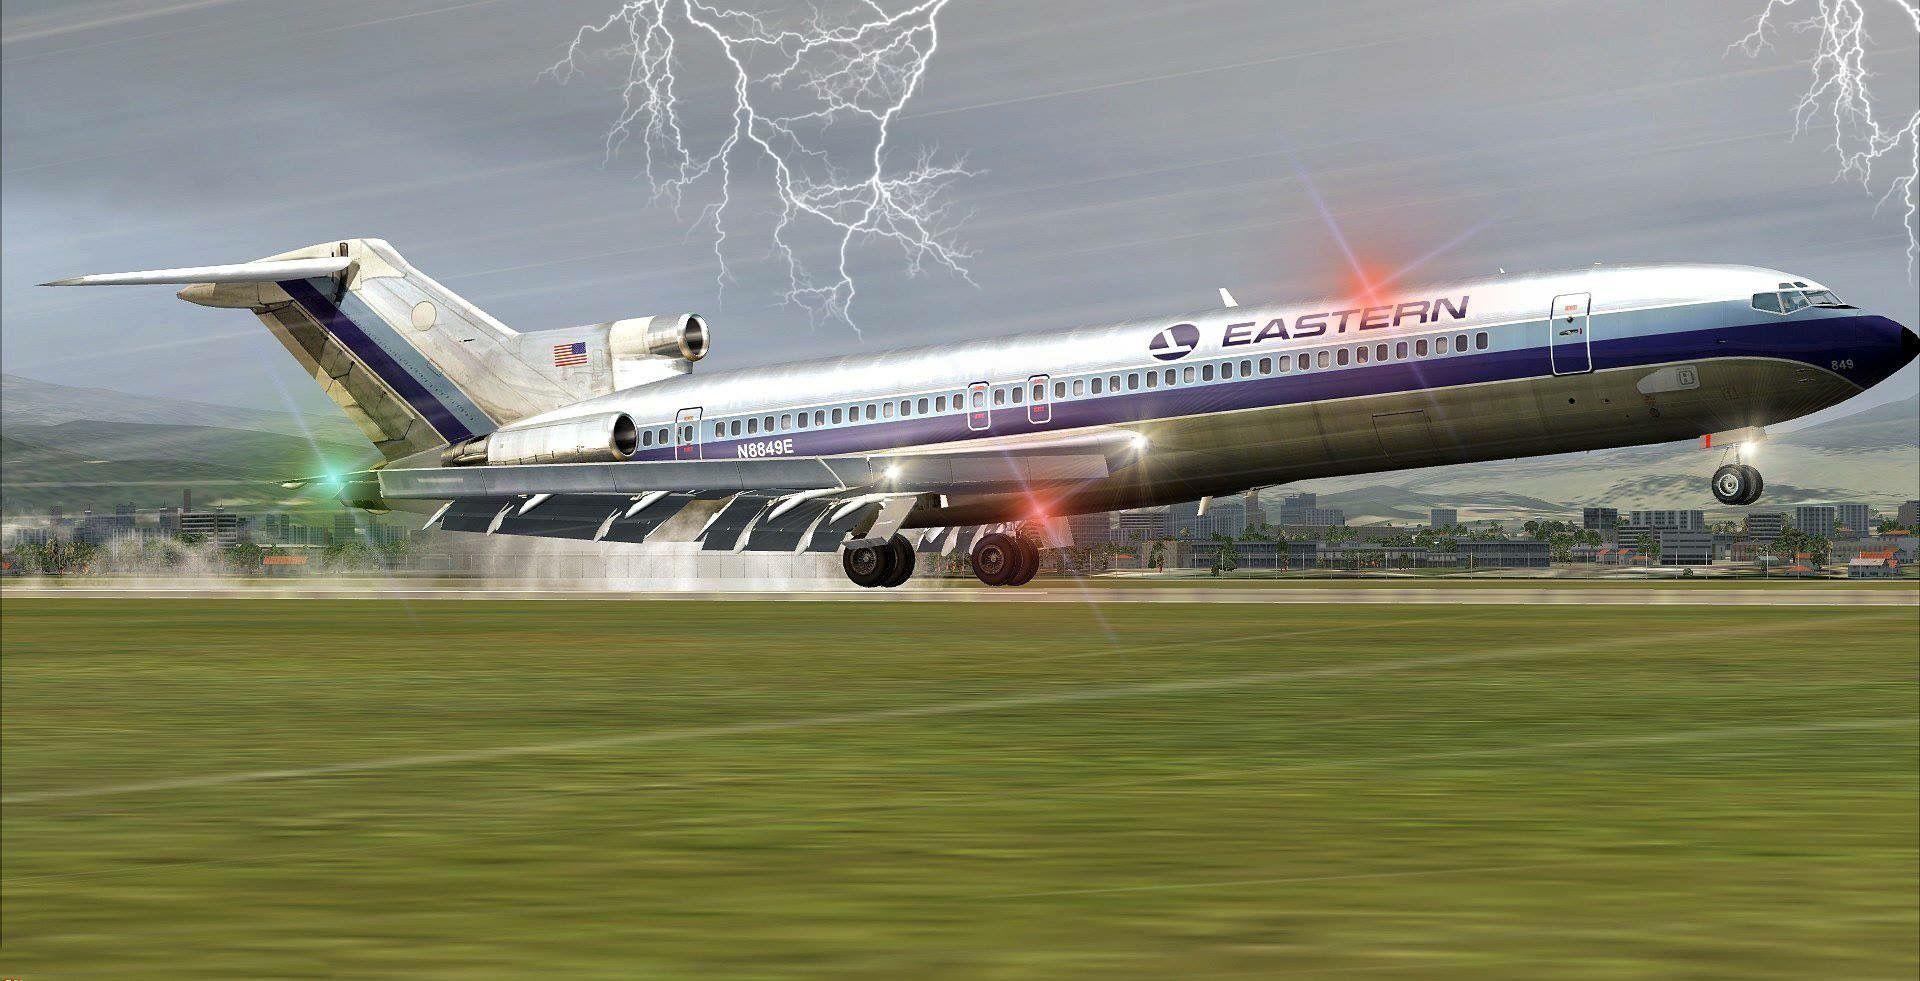 Pin by Maryann Mixon on Thankful board Passenger jet